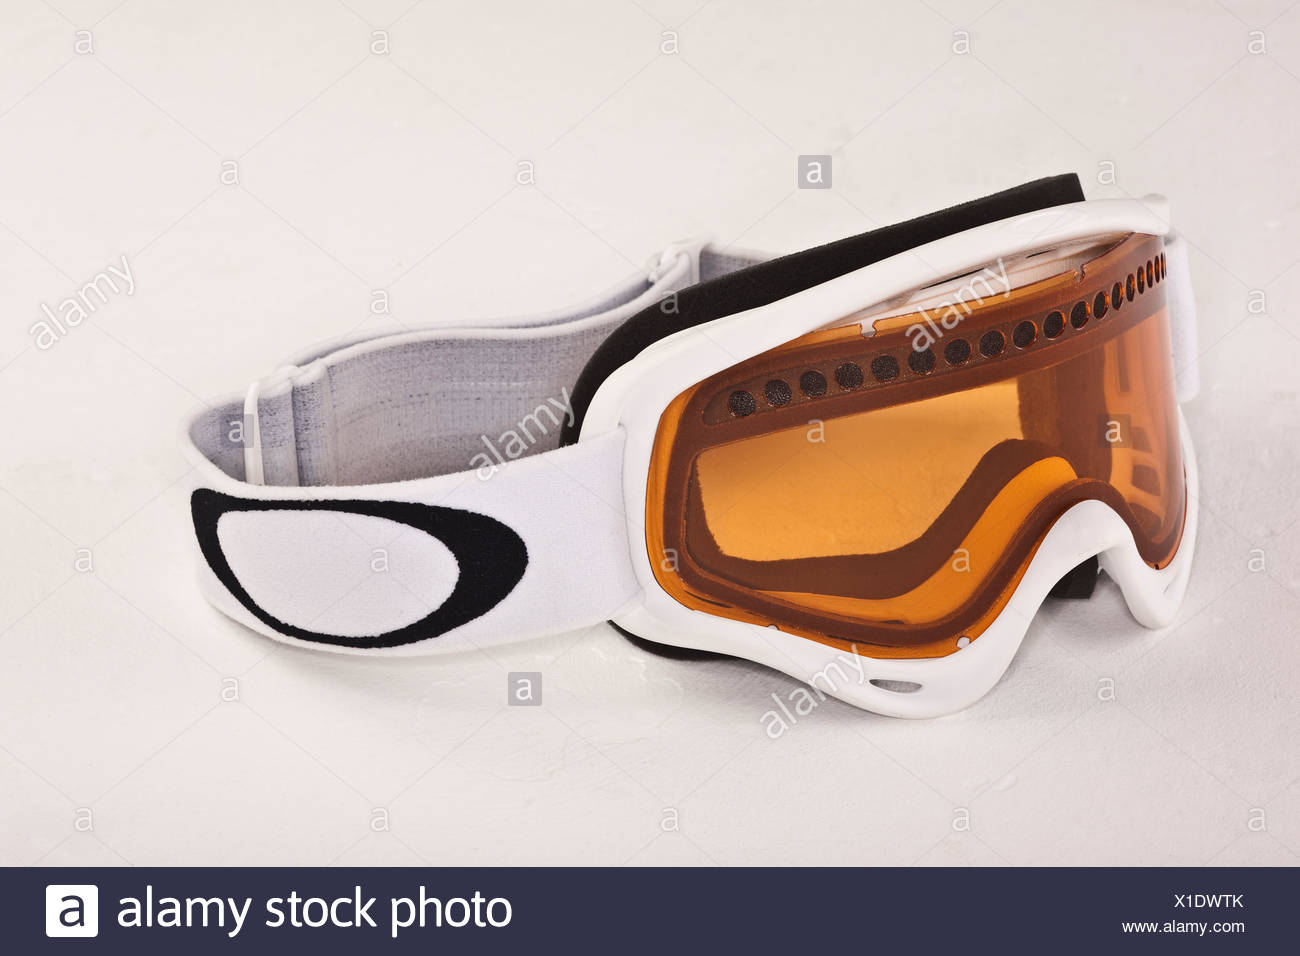 Aki goggles with headband and yellow tinted glass - Stock Image